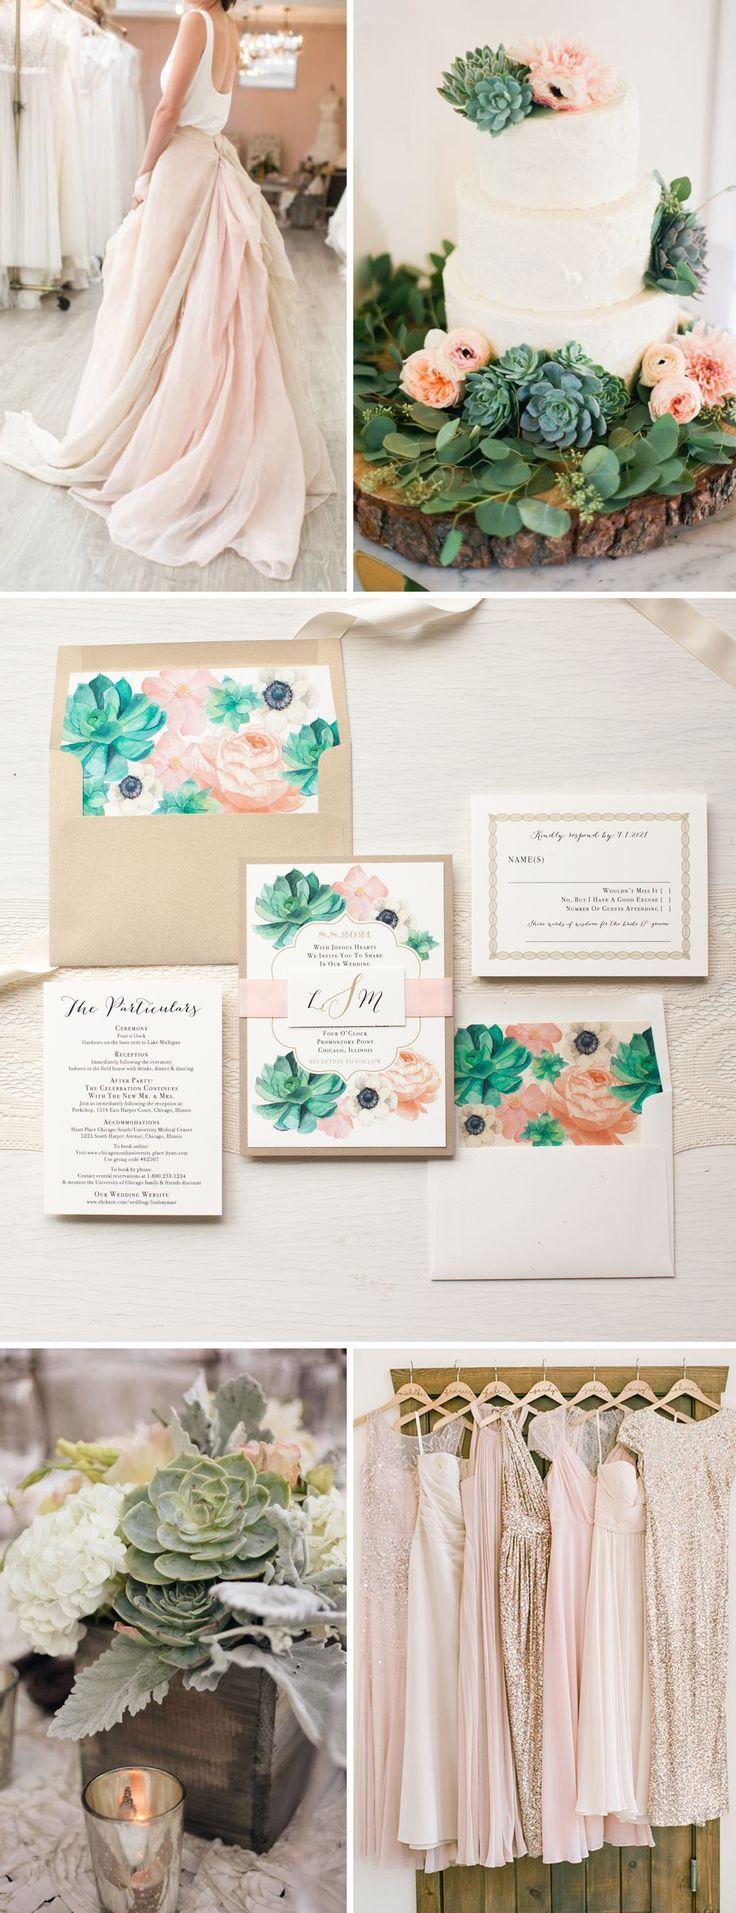 How to scrapbook a wedding invitation - Blush Succulent Anemone Wedding Invitations